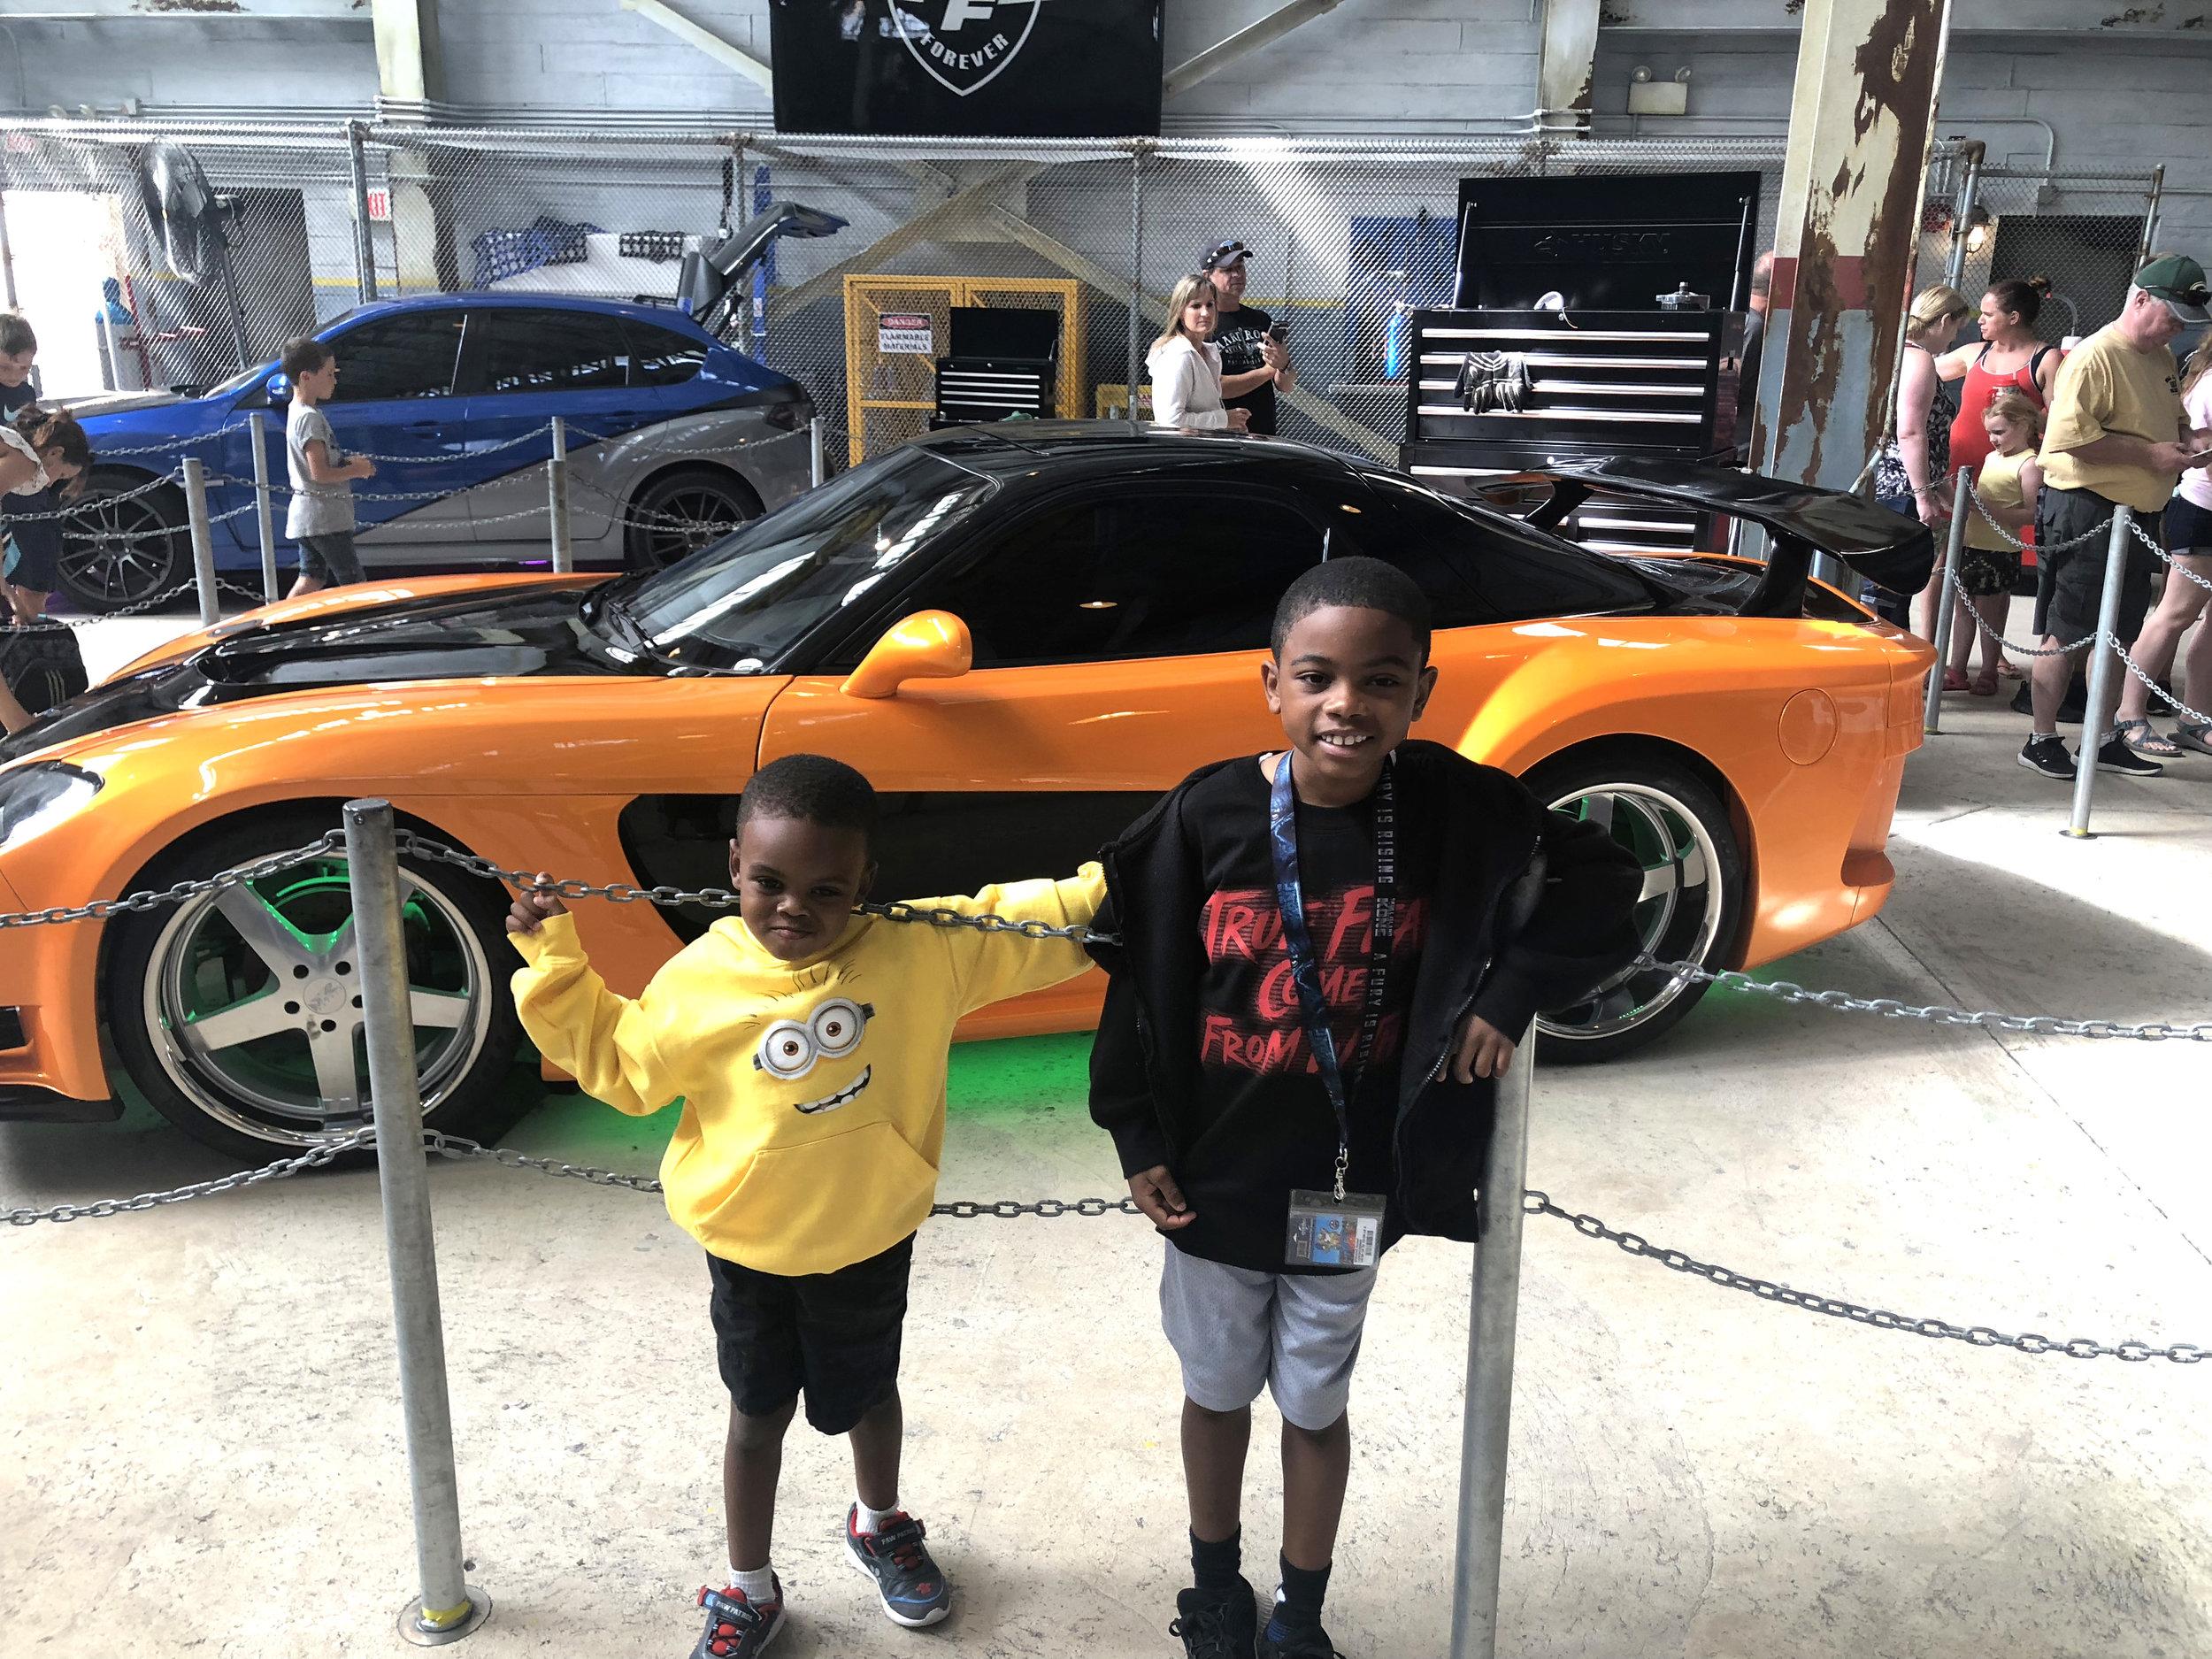 The boys enjoying a car show